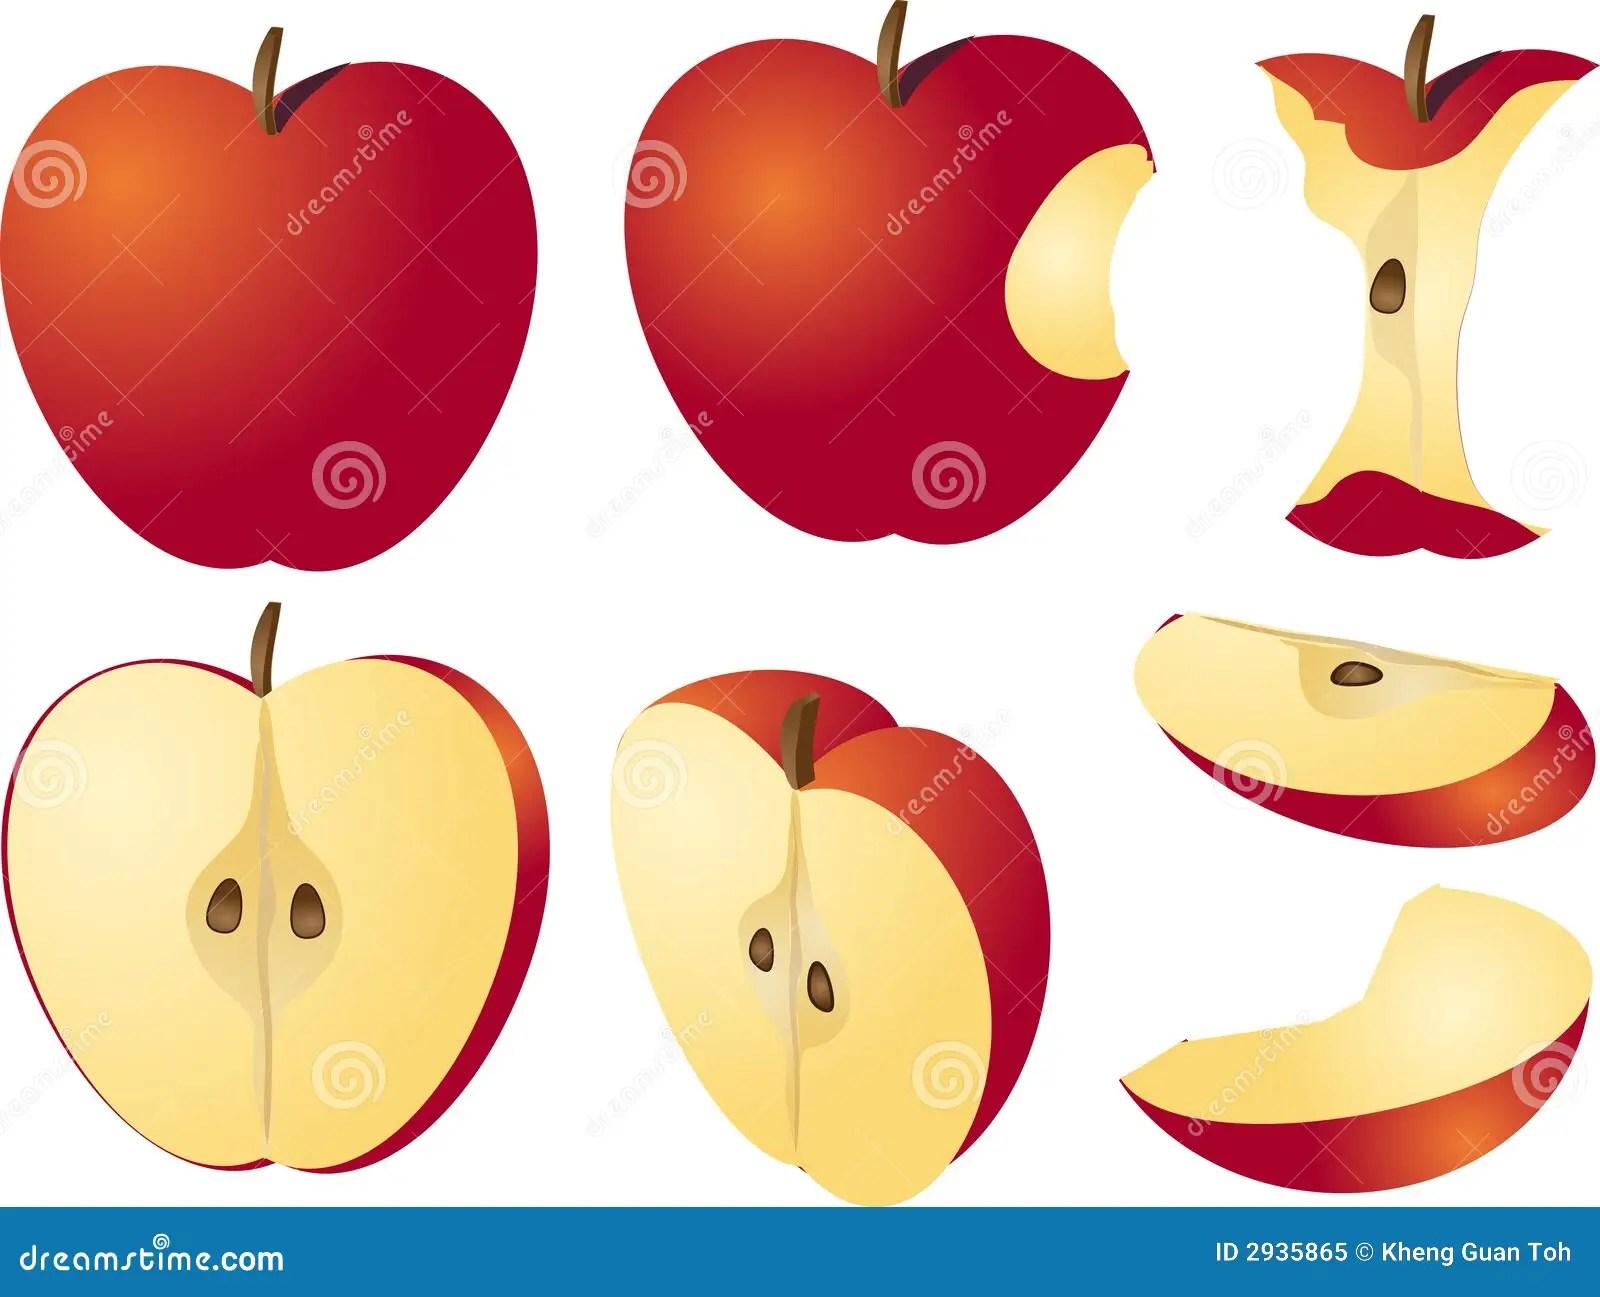 Apple Illustration Royalty Free Stock Photo